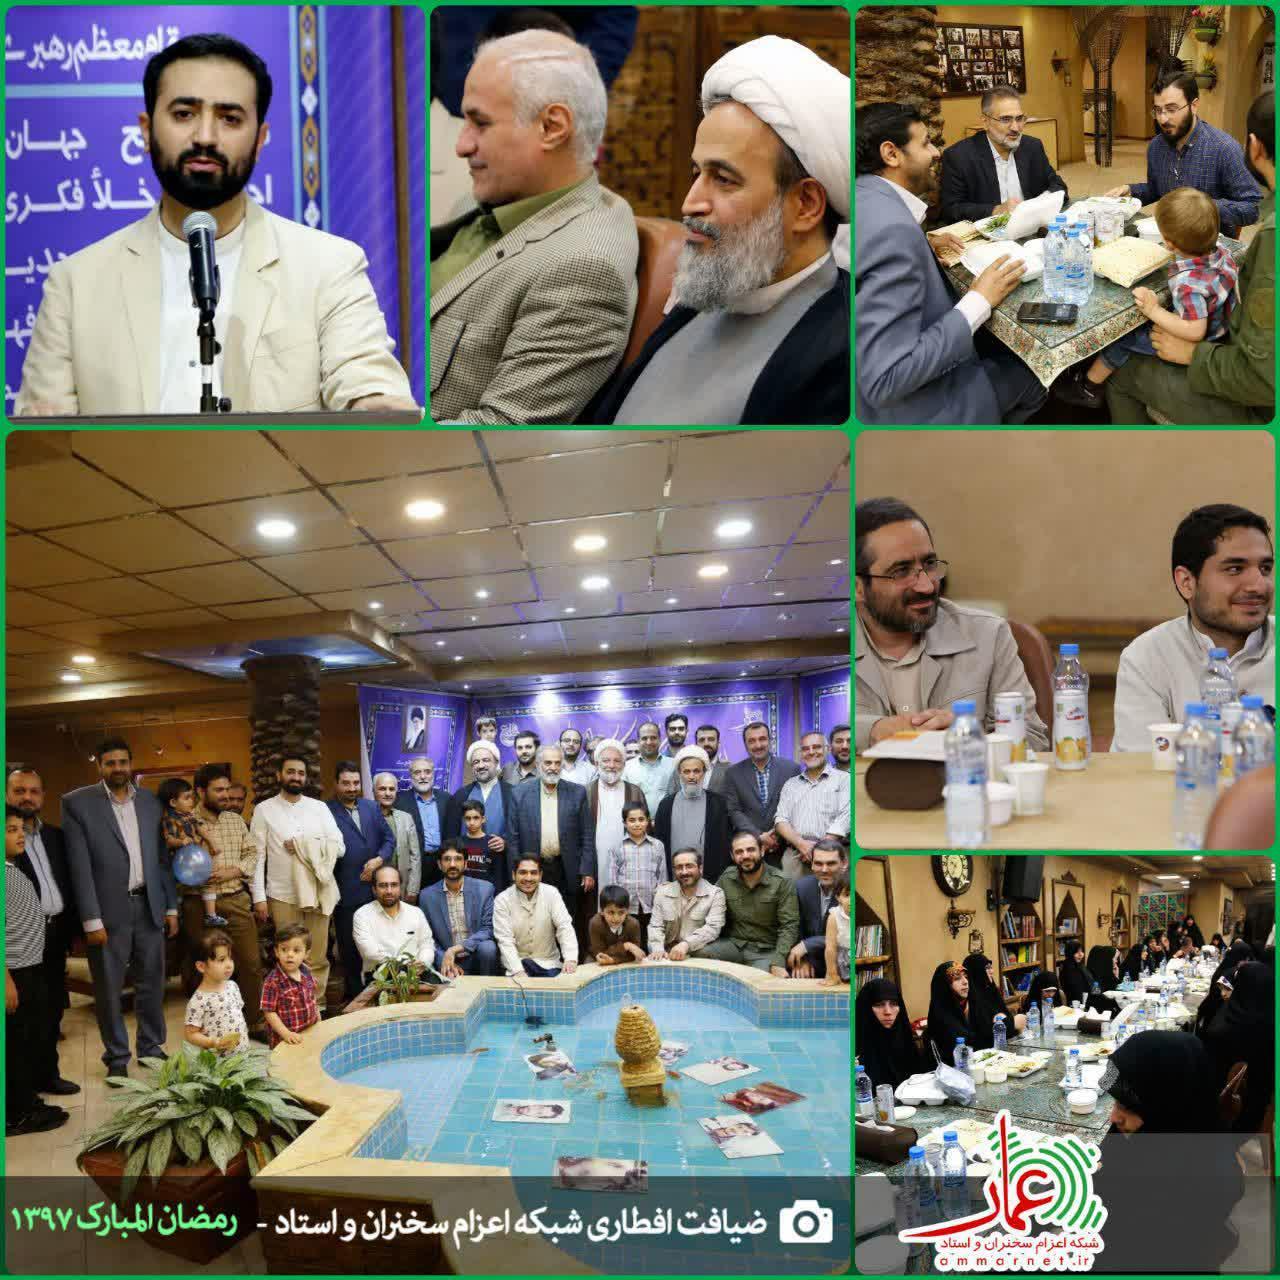 http://dl-abbasi.ir/yekta/1397/Image/Tehran/Ammarnet/IMG_970323-4.jpg